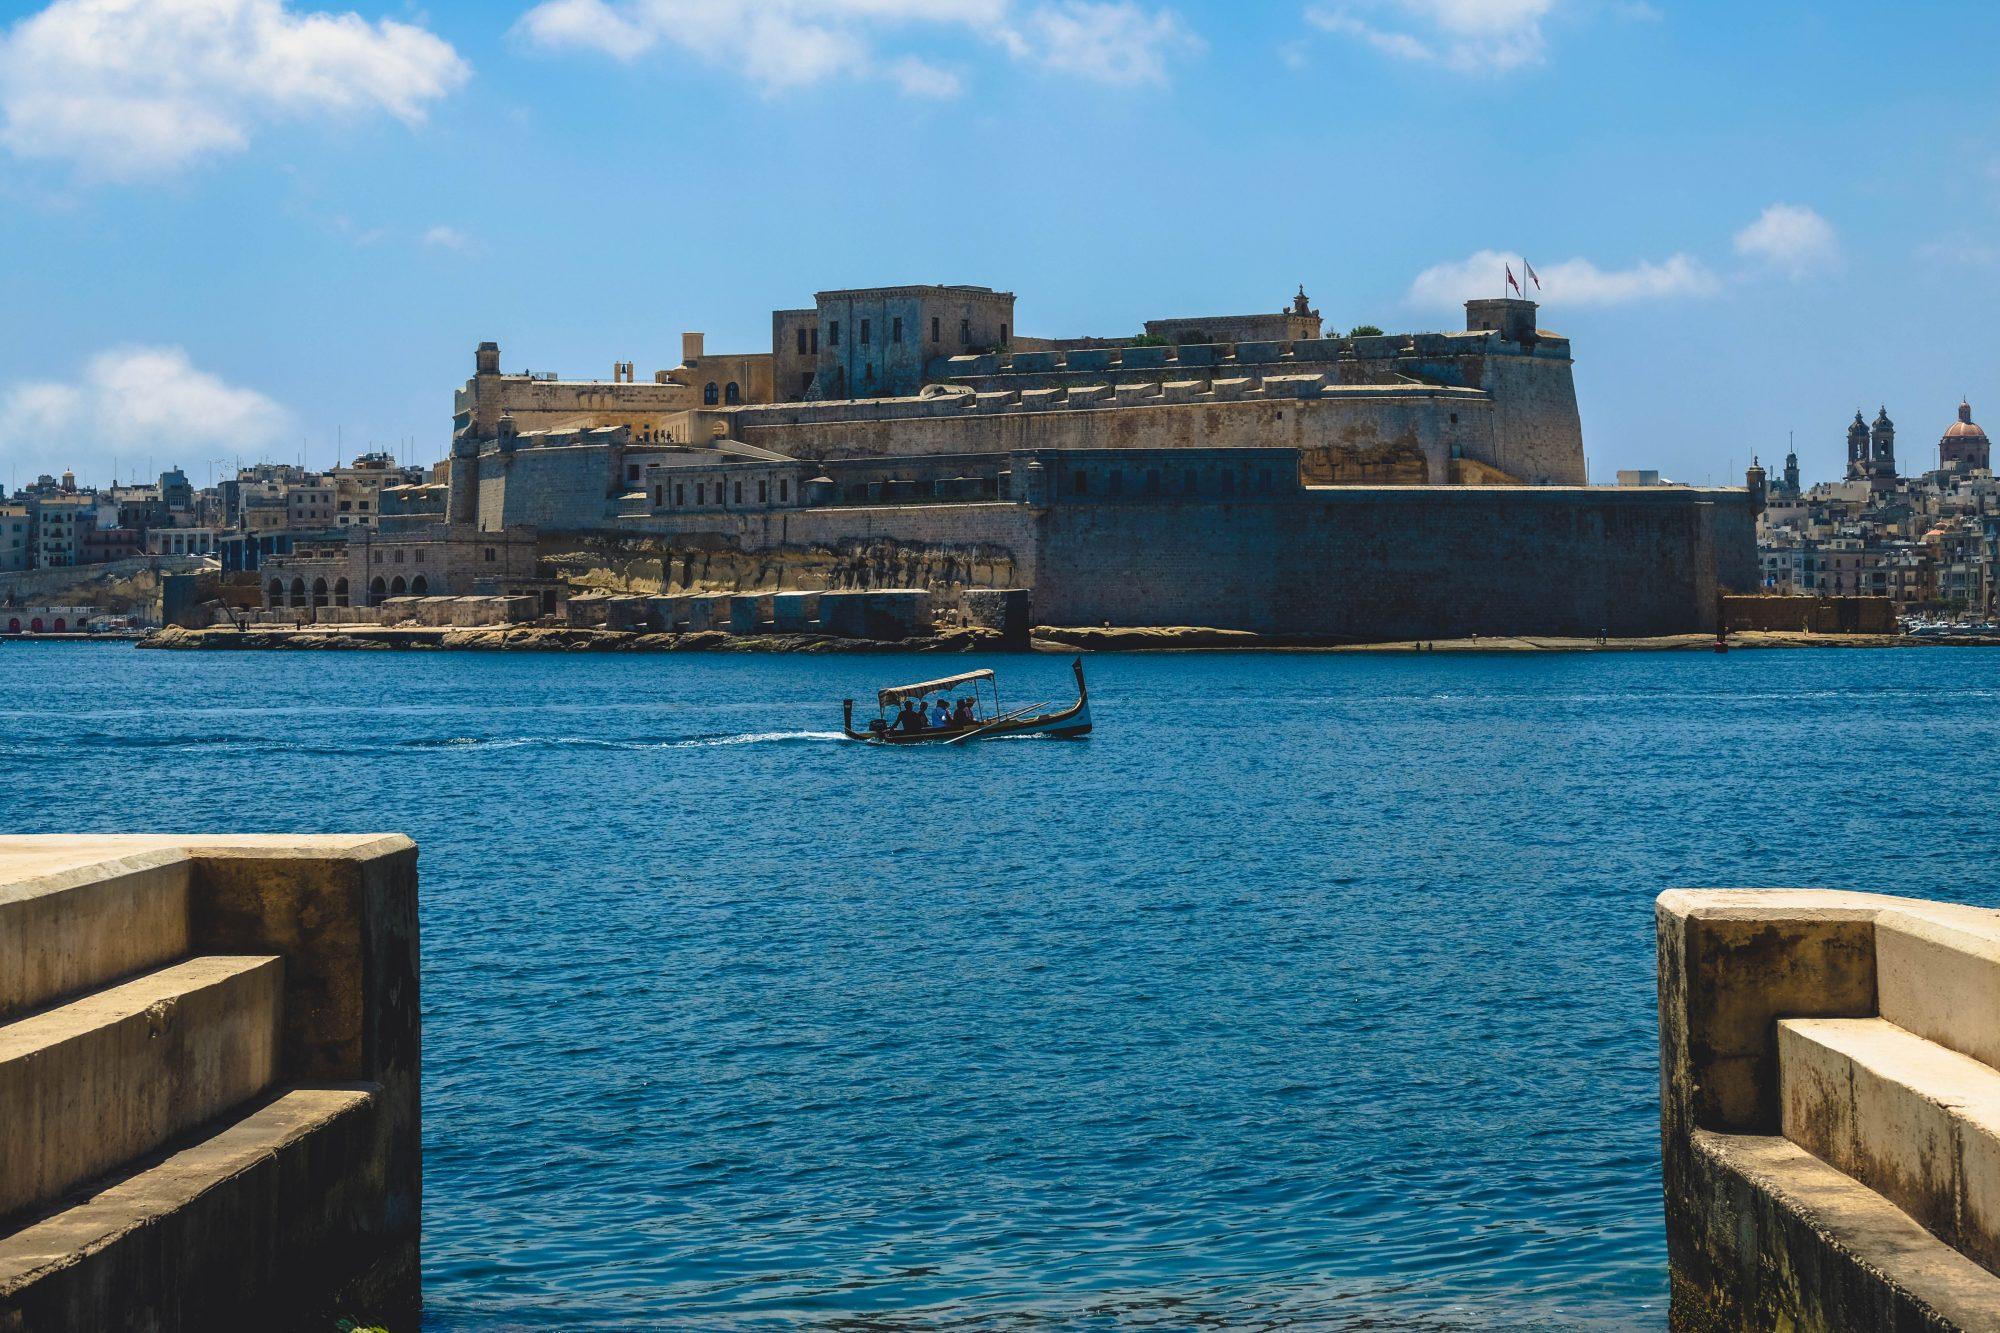 Quai de Xatt Il-Barriera, Malte